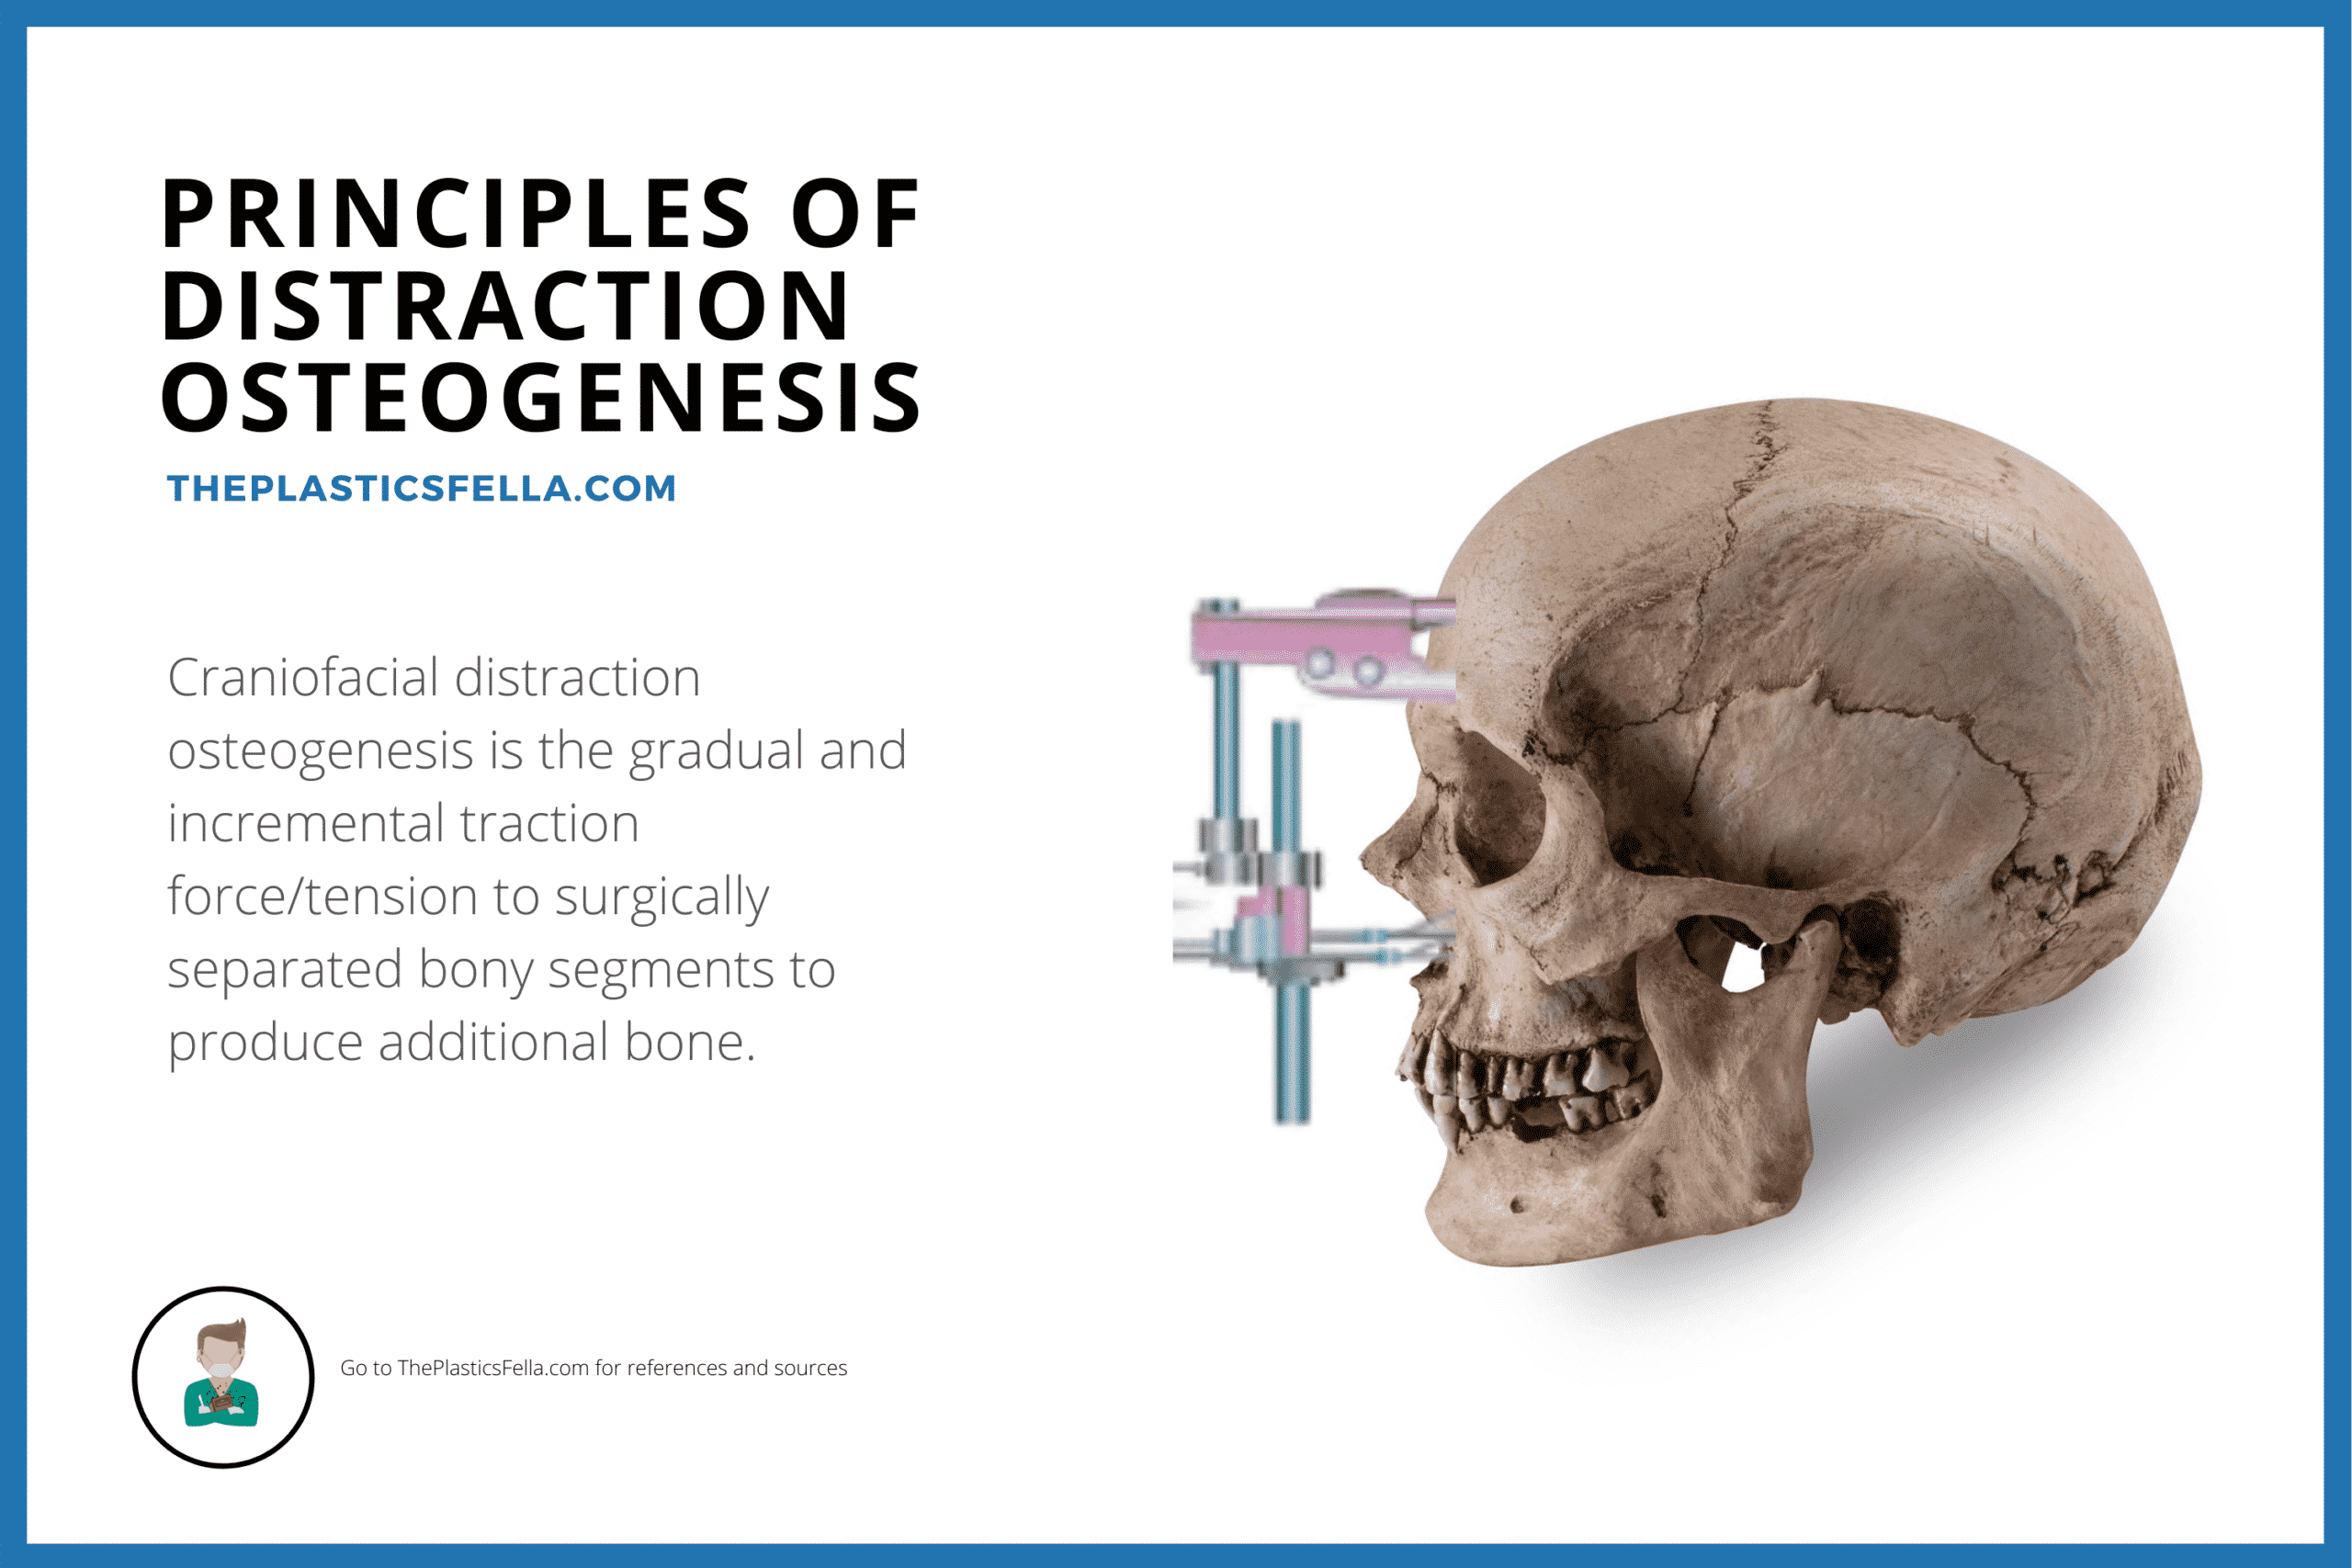 Principles of Craniofacial Distraction Osteogenesis